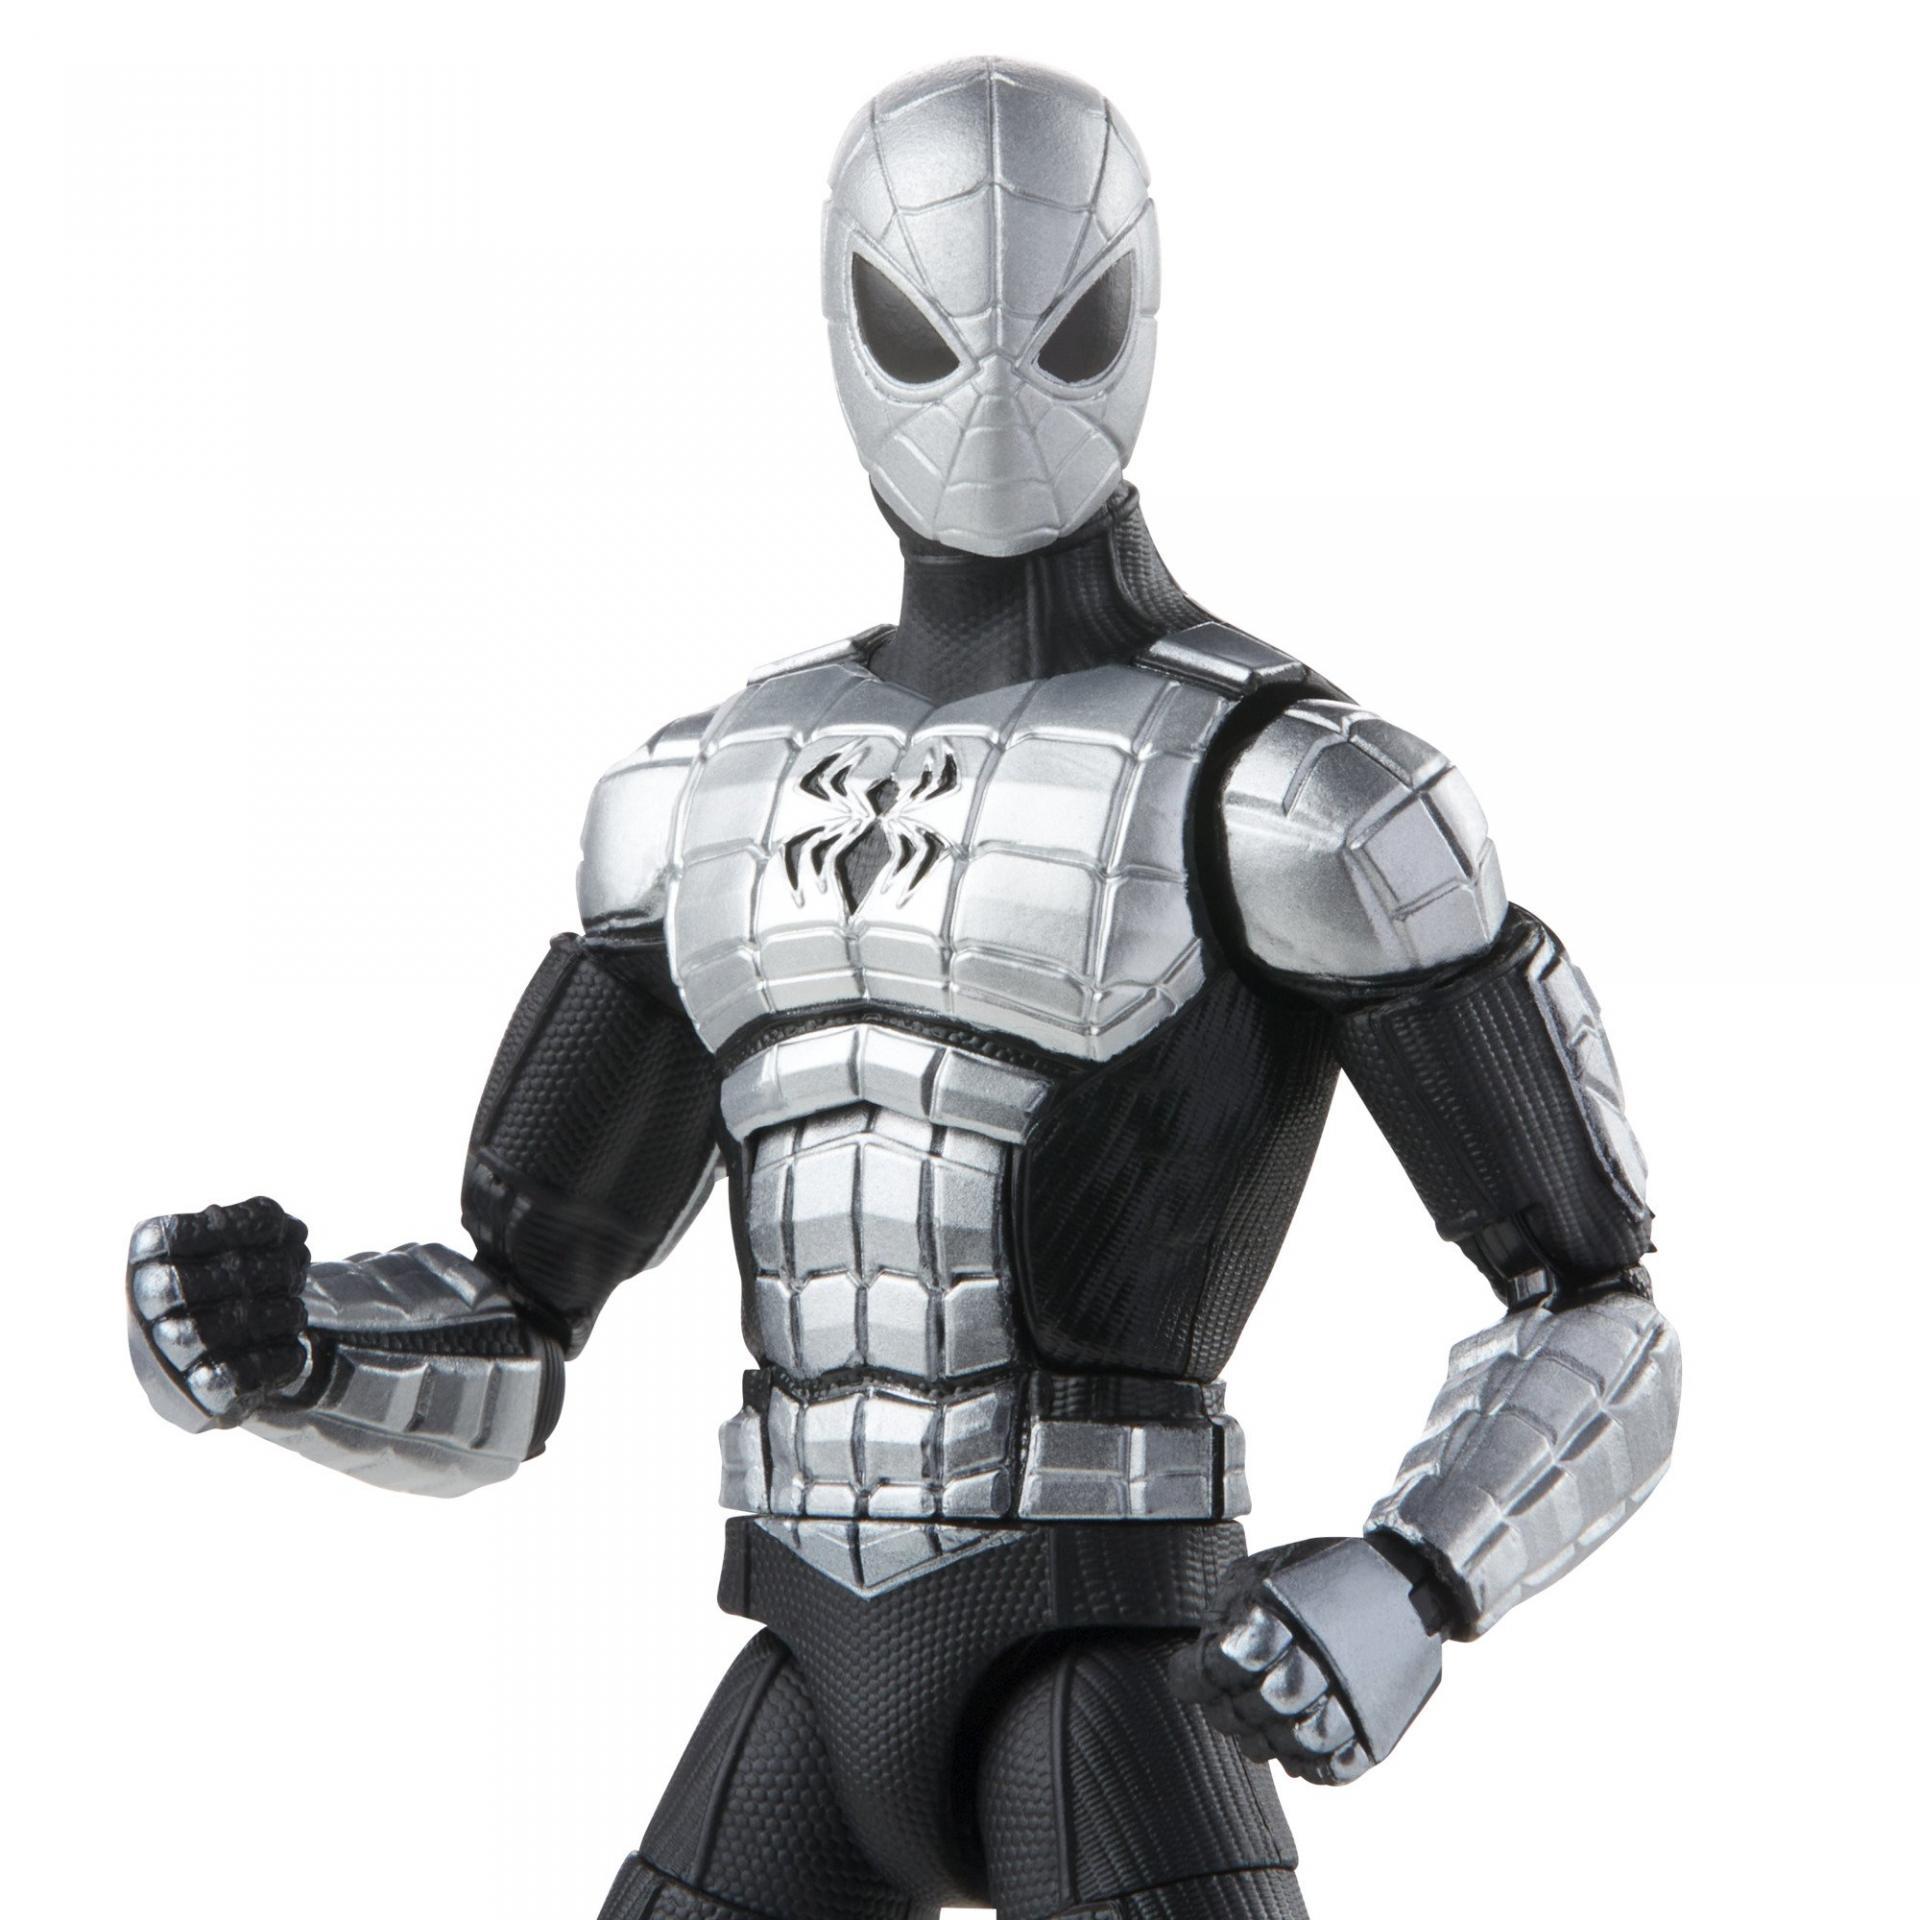 Marvel legends series hasbro spider armor mk i9 1